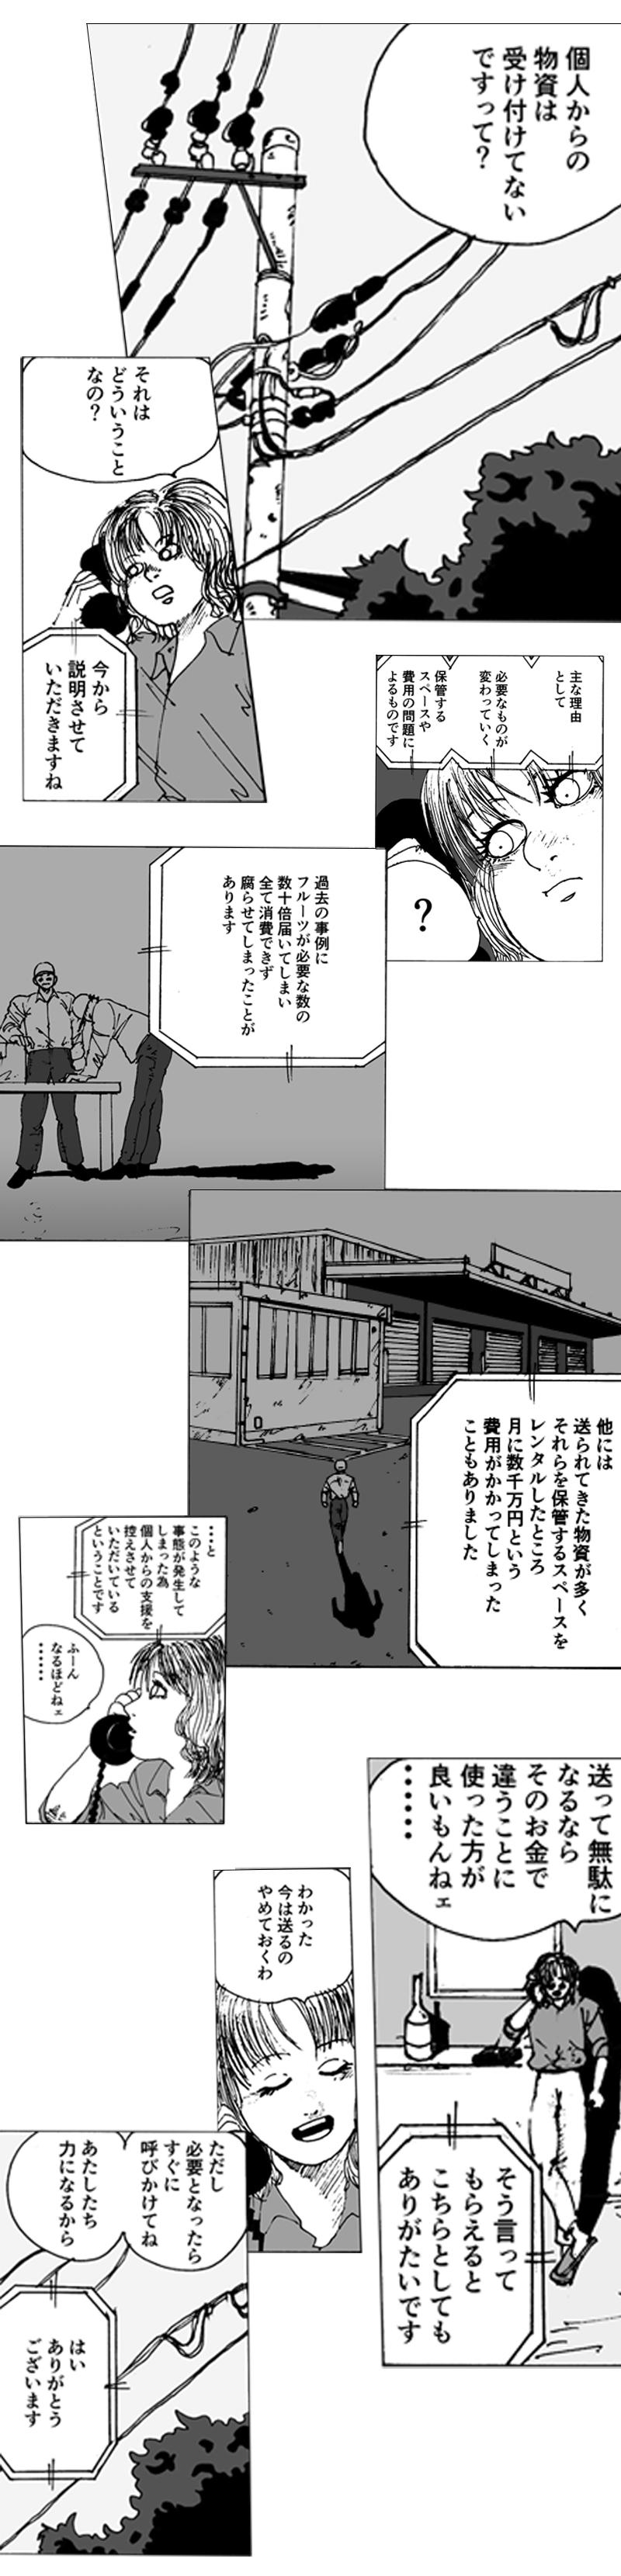 Yahoo!-漫画-完-縦